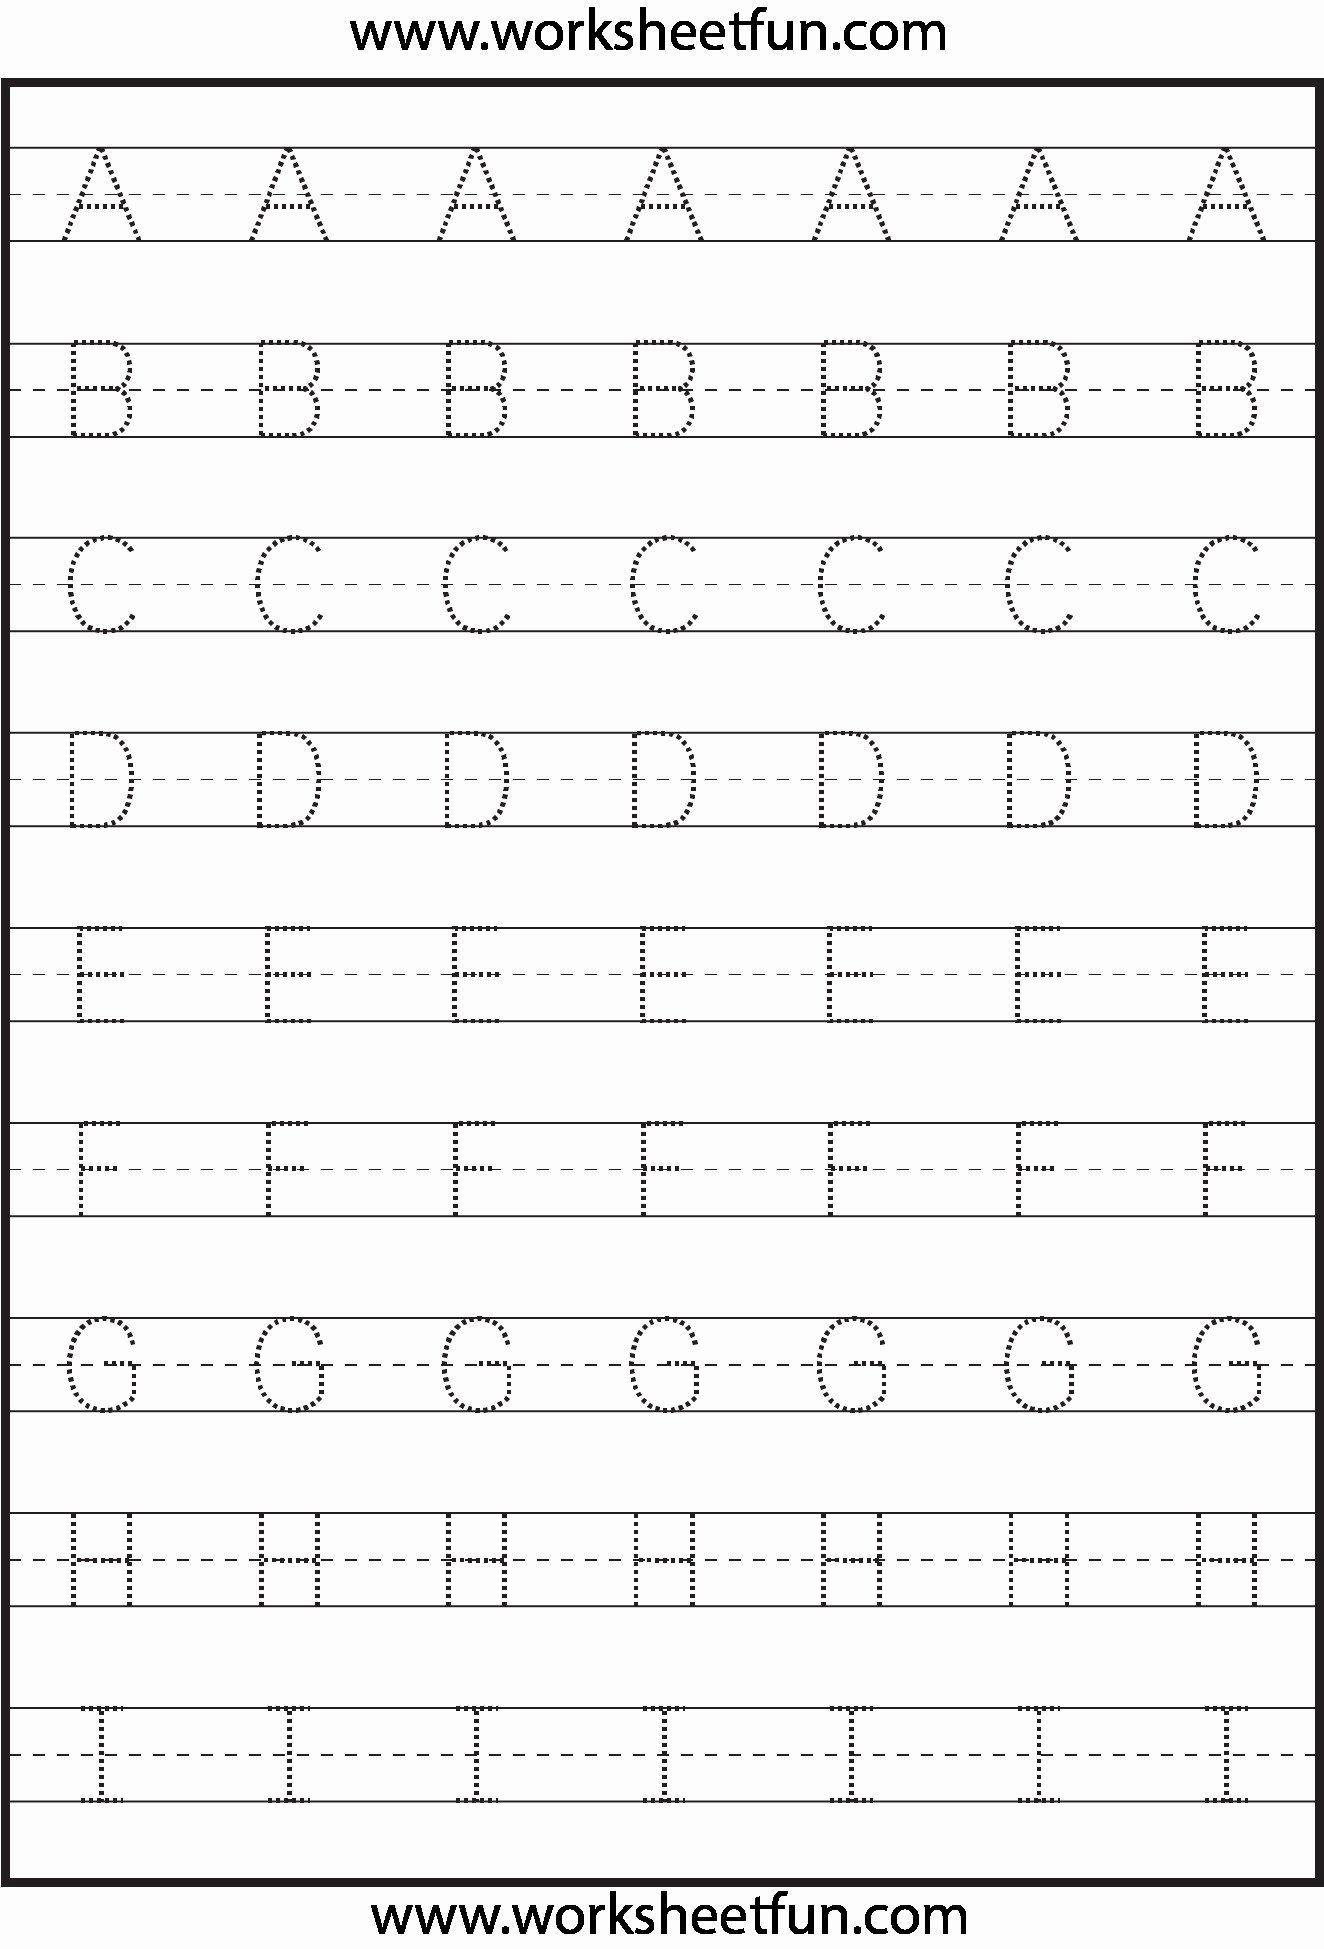 Printable Abc Worksheets For Preschoolers